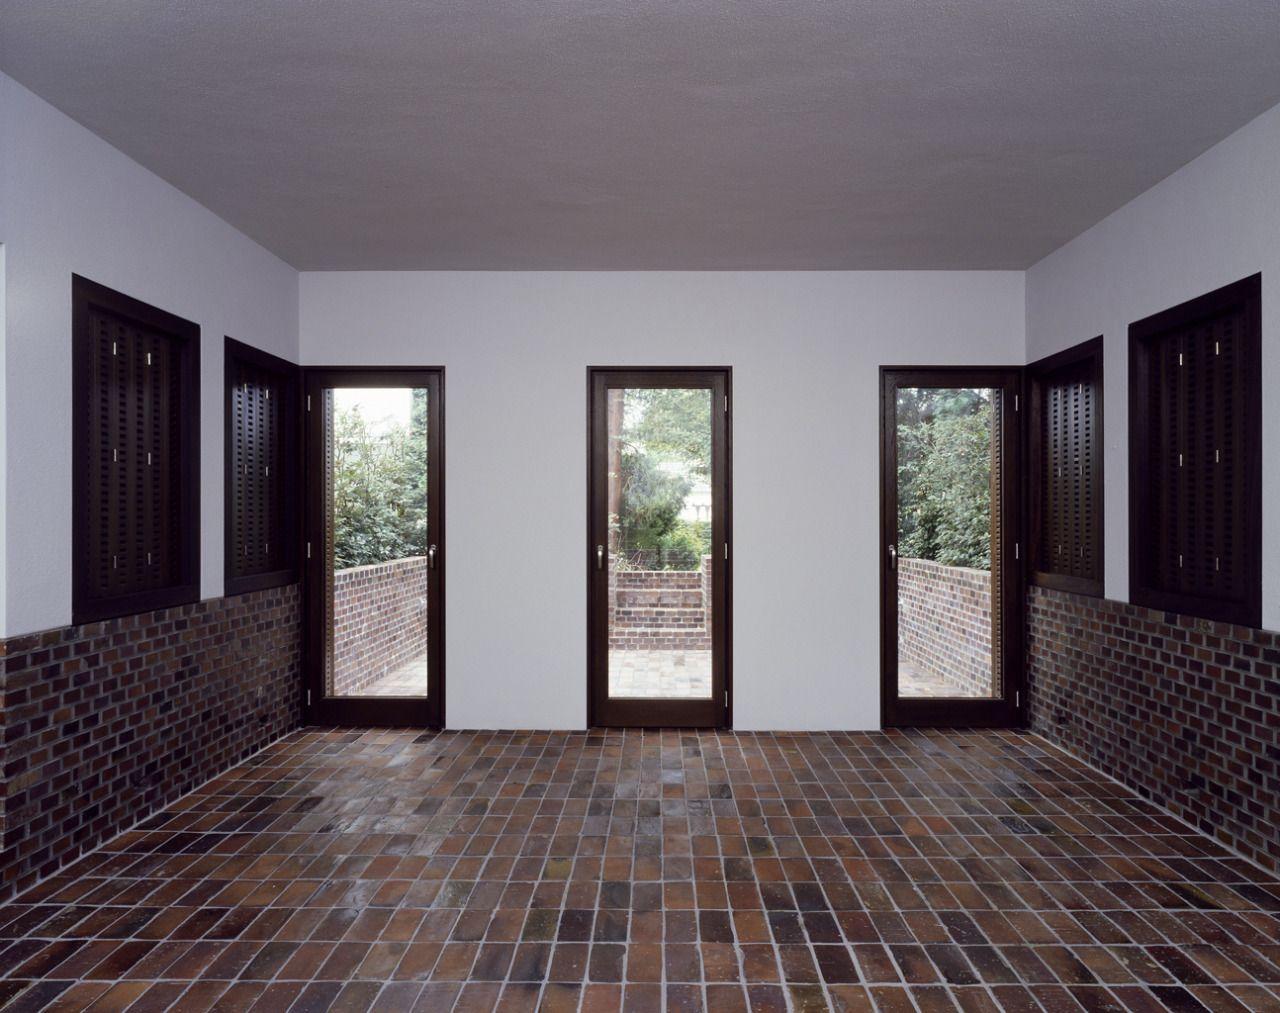 Hundertacht House, Bonn, Germany, Uwe Schröder, 2007